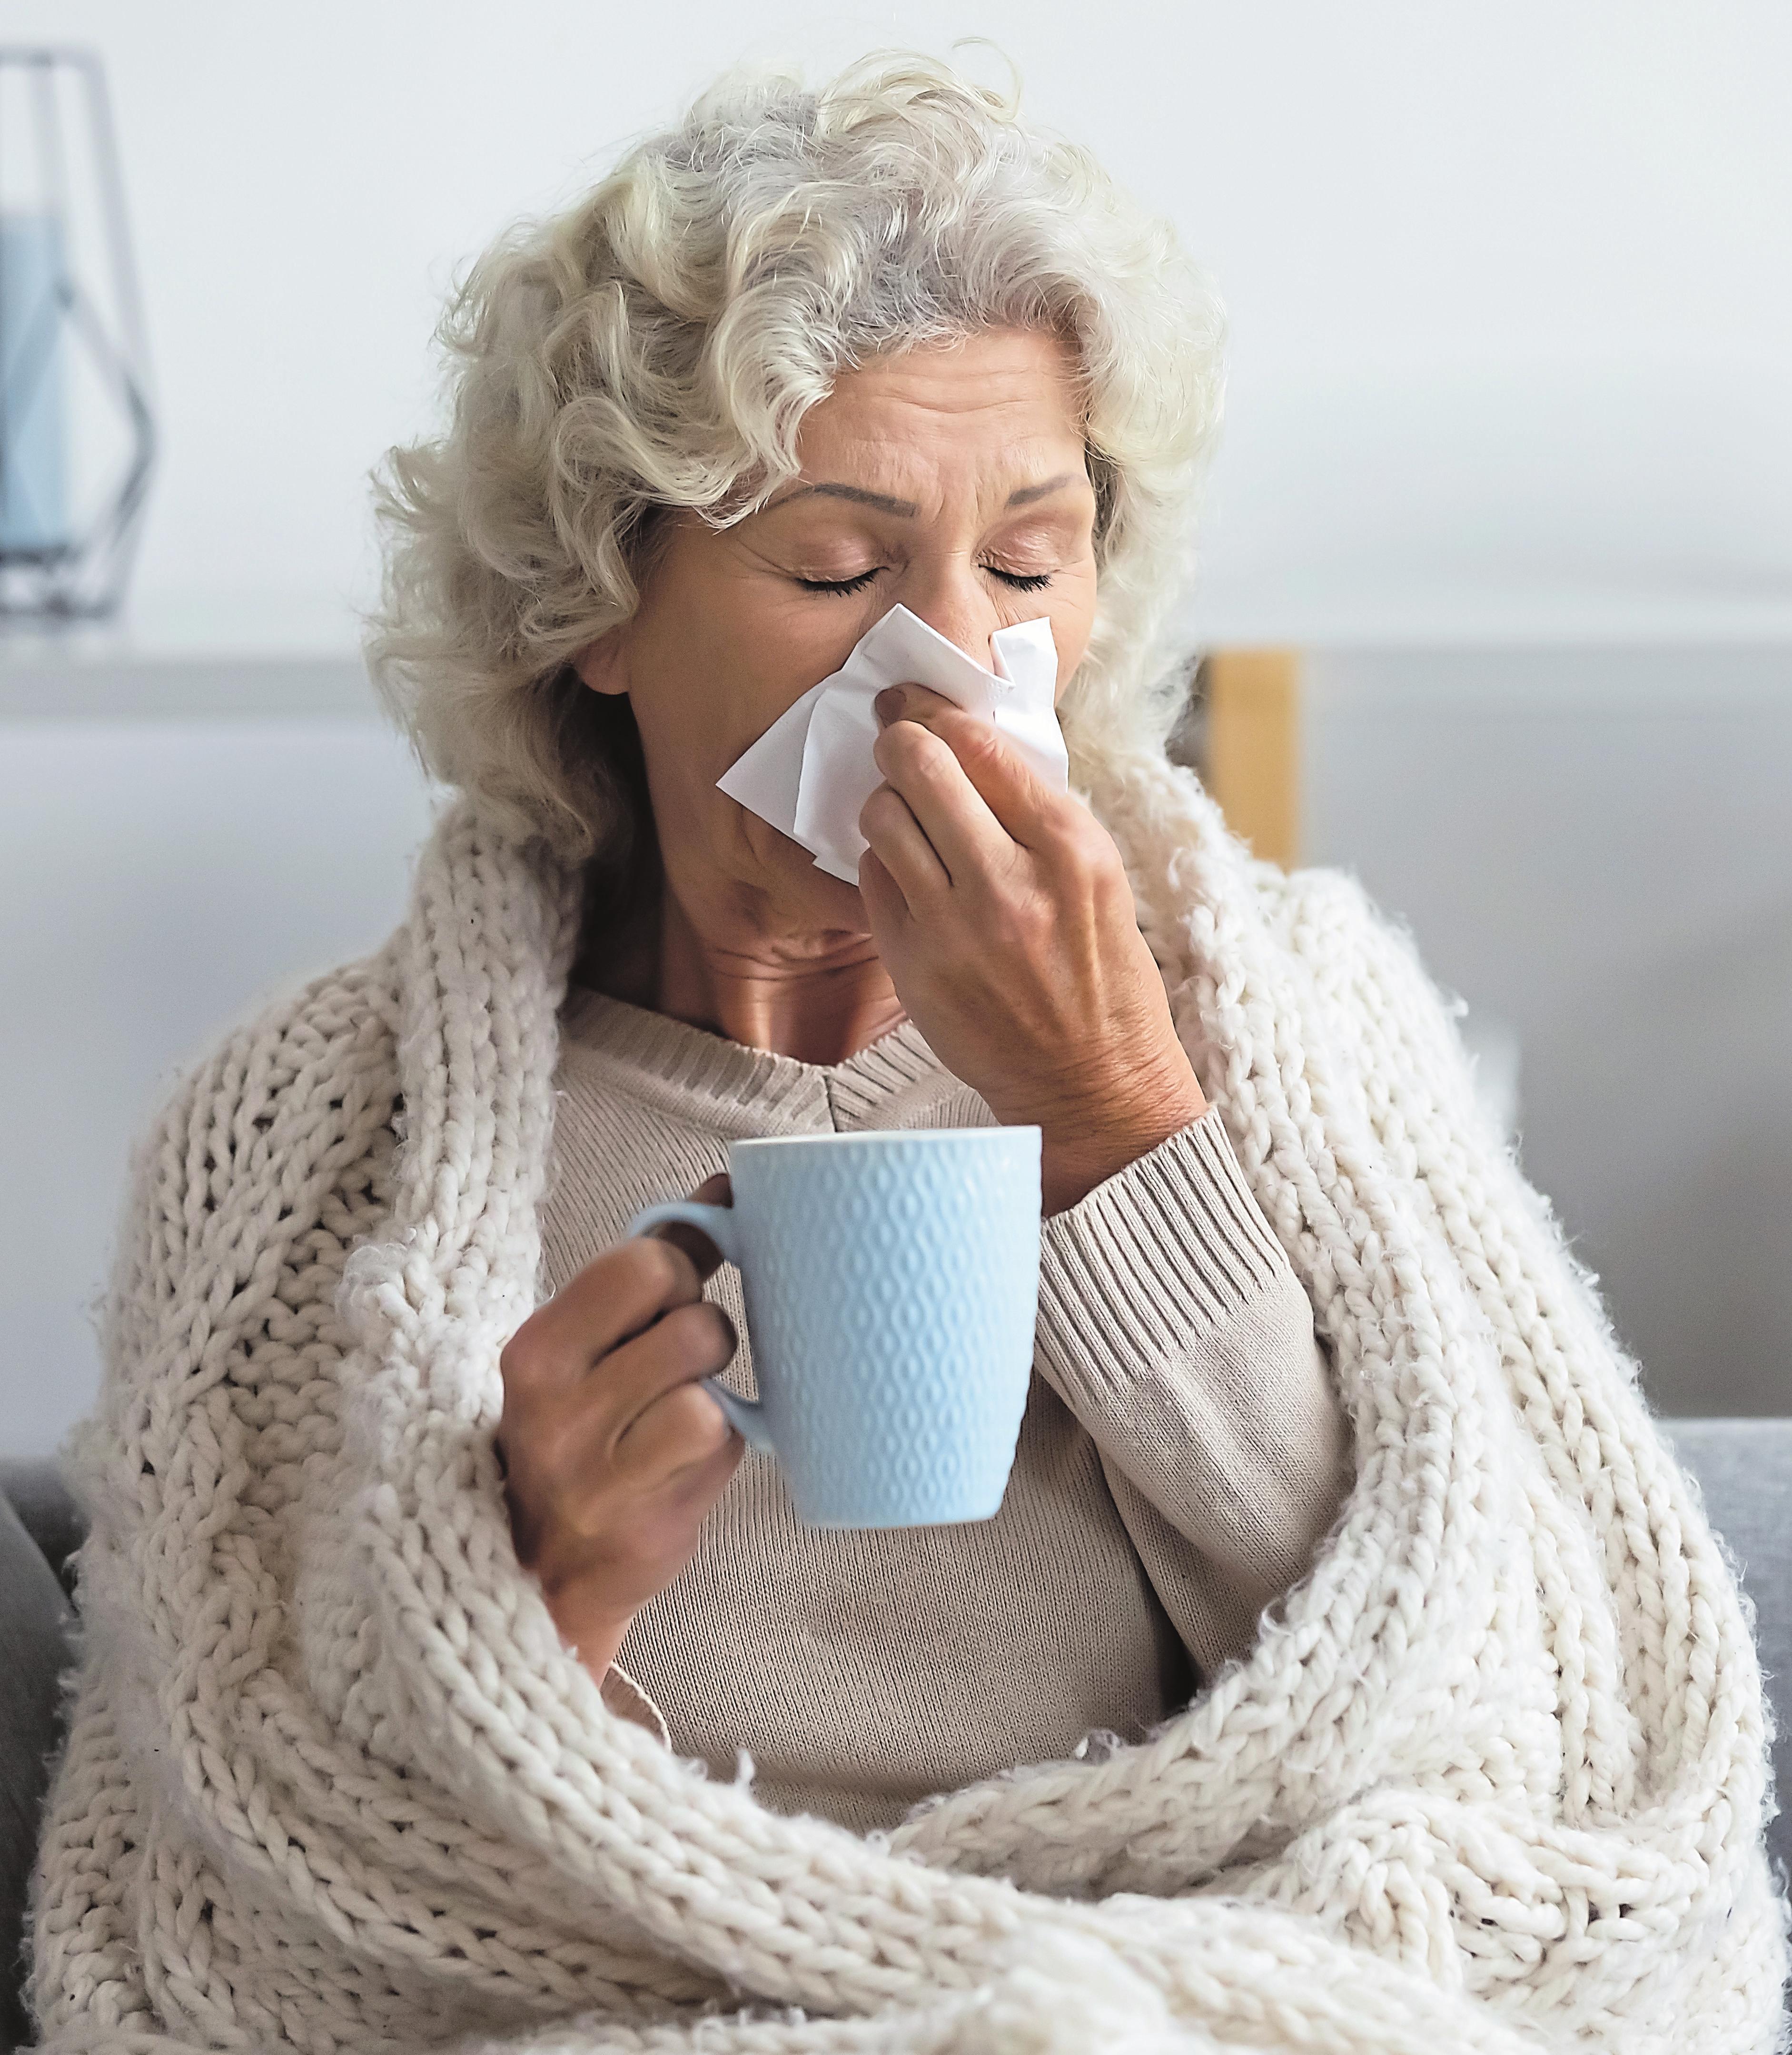 Wappnen Sie sich gegen die Wintererkältung. Foto: Shutterstock